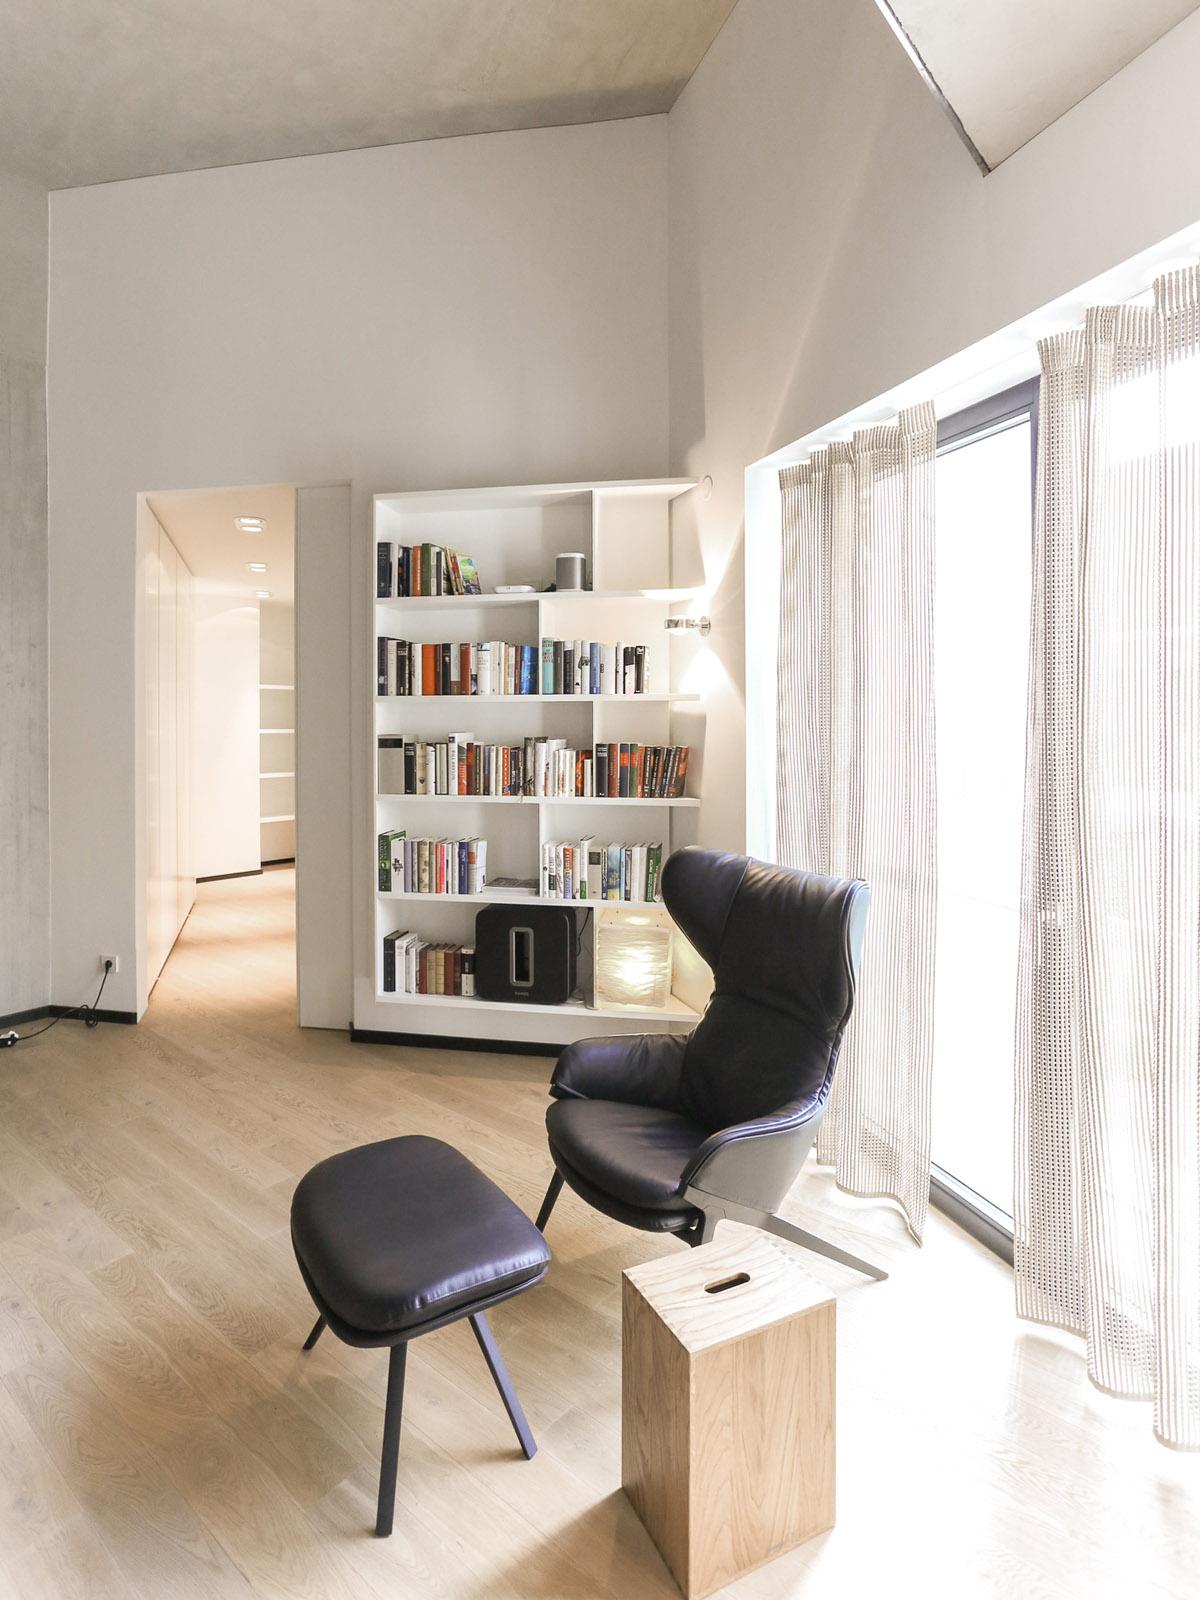 Richard-Moessmer-Bibliothek-2